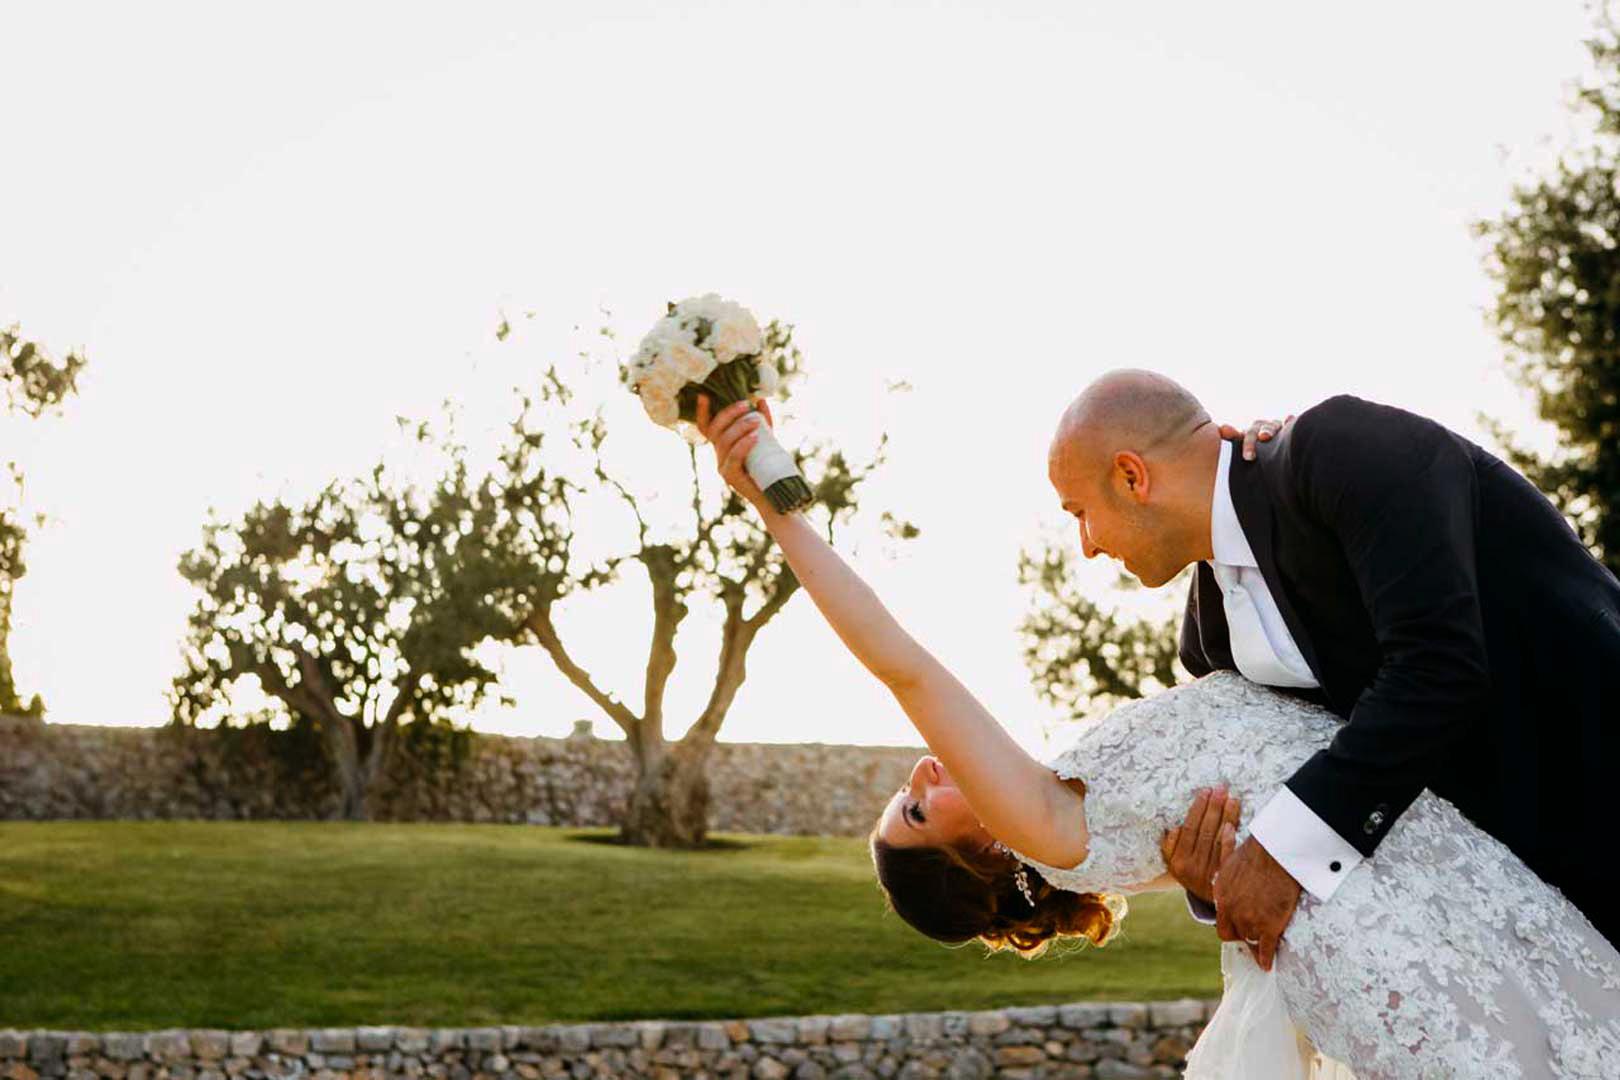 041-matrimonio-puglia-gianni-lepore-wedding-photographer